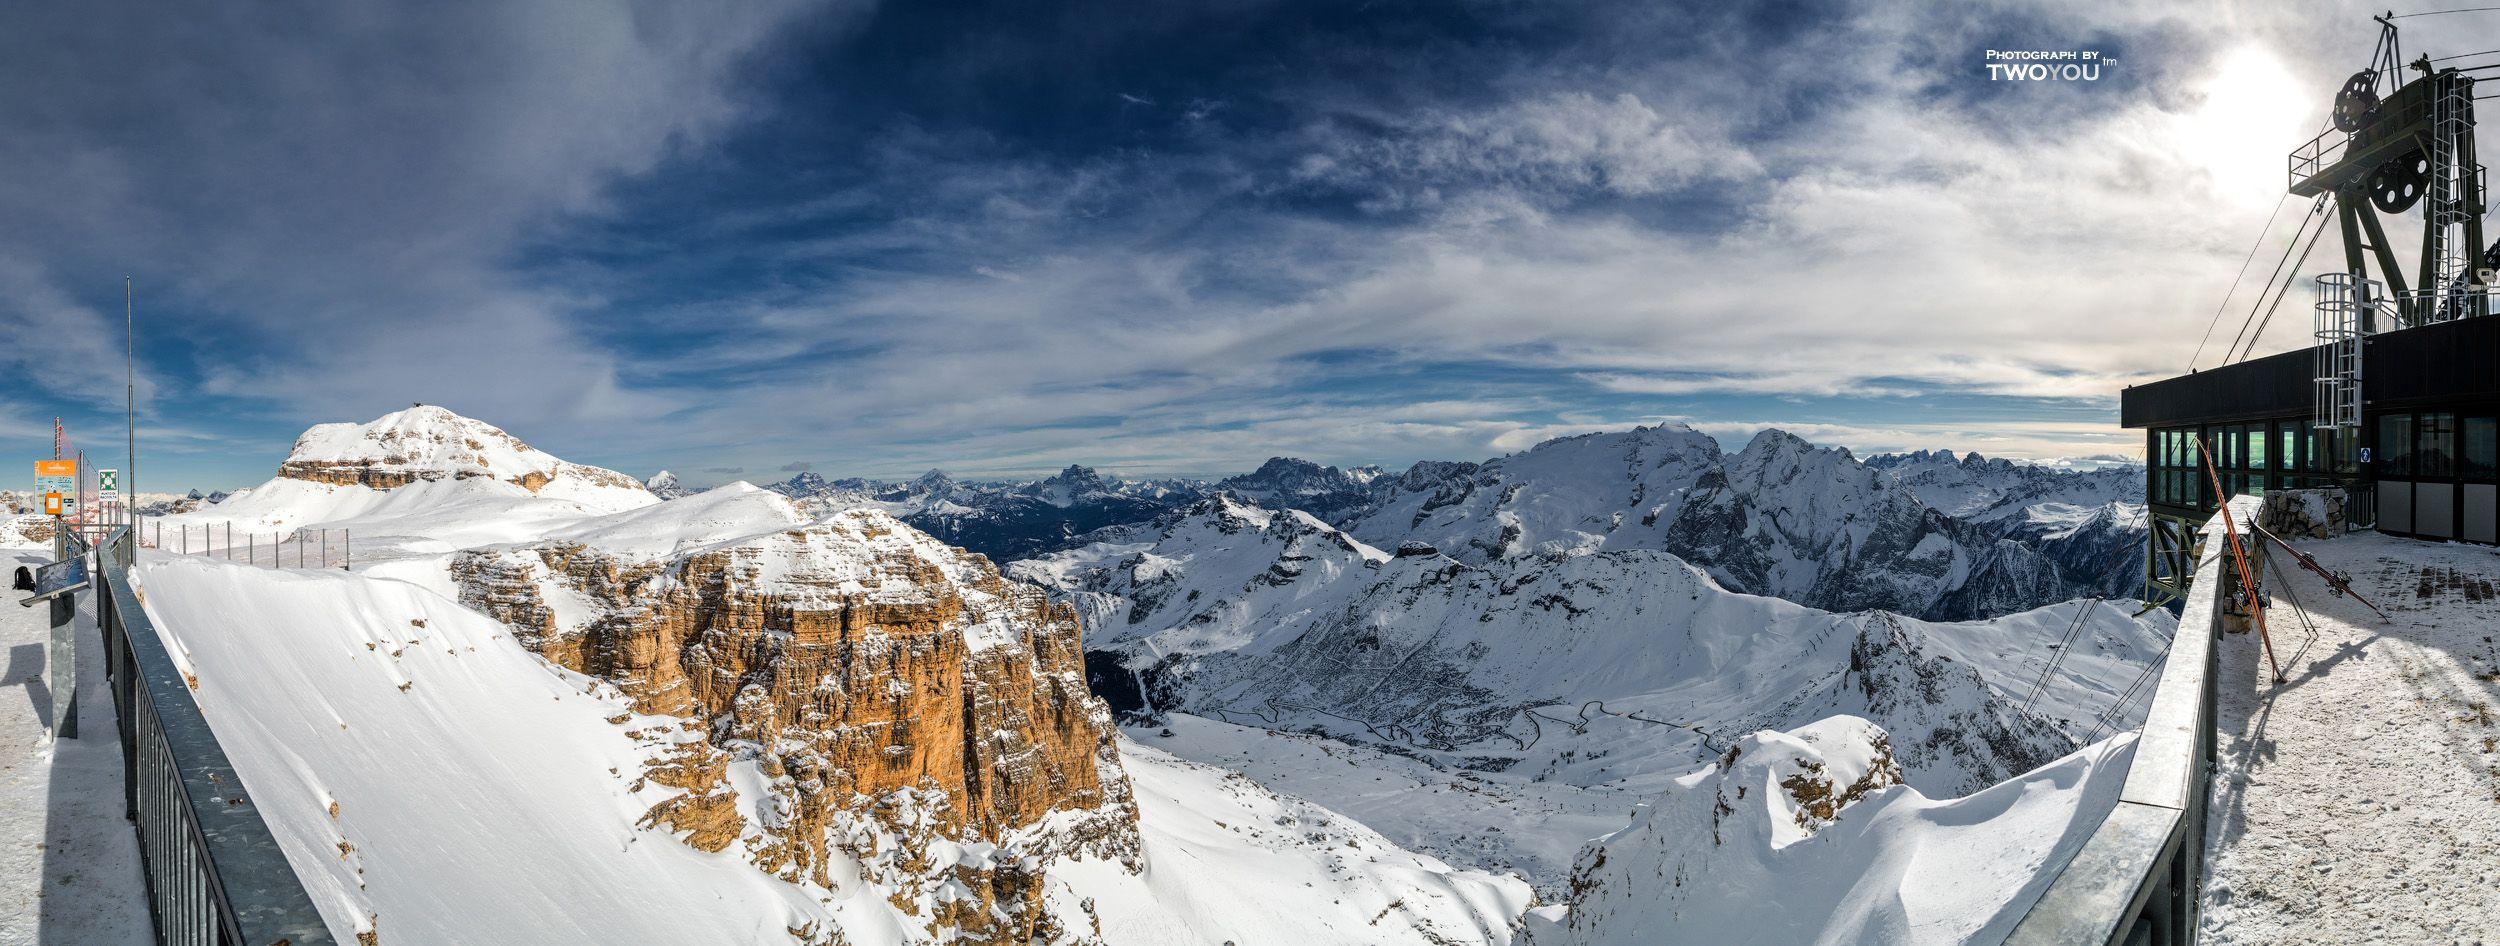 Панорама дня: Пассо Пордои.